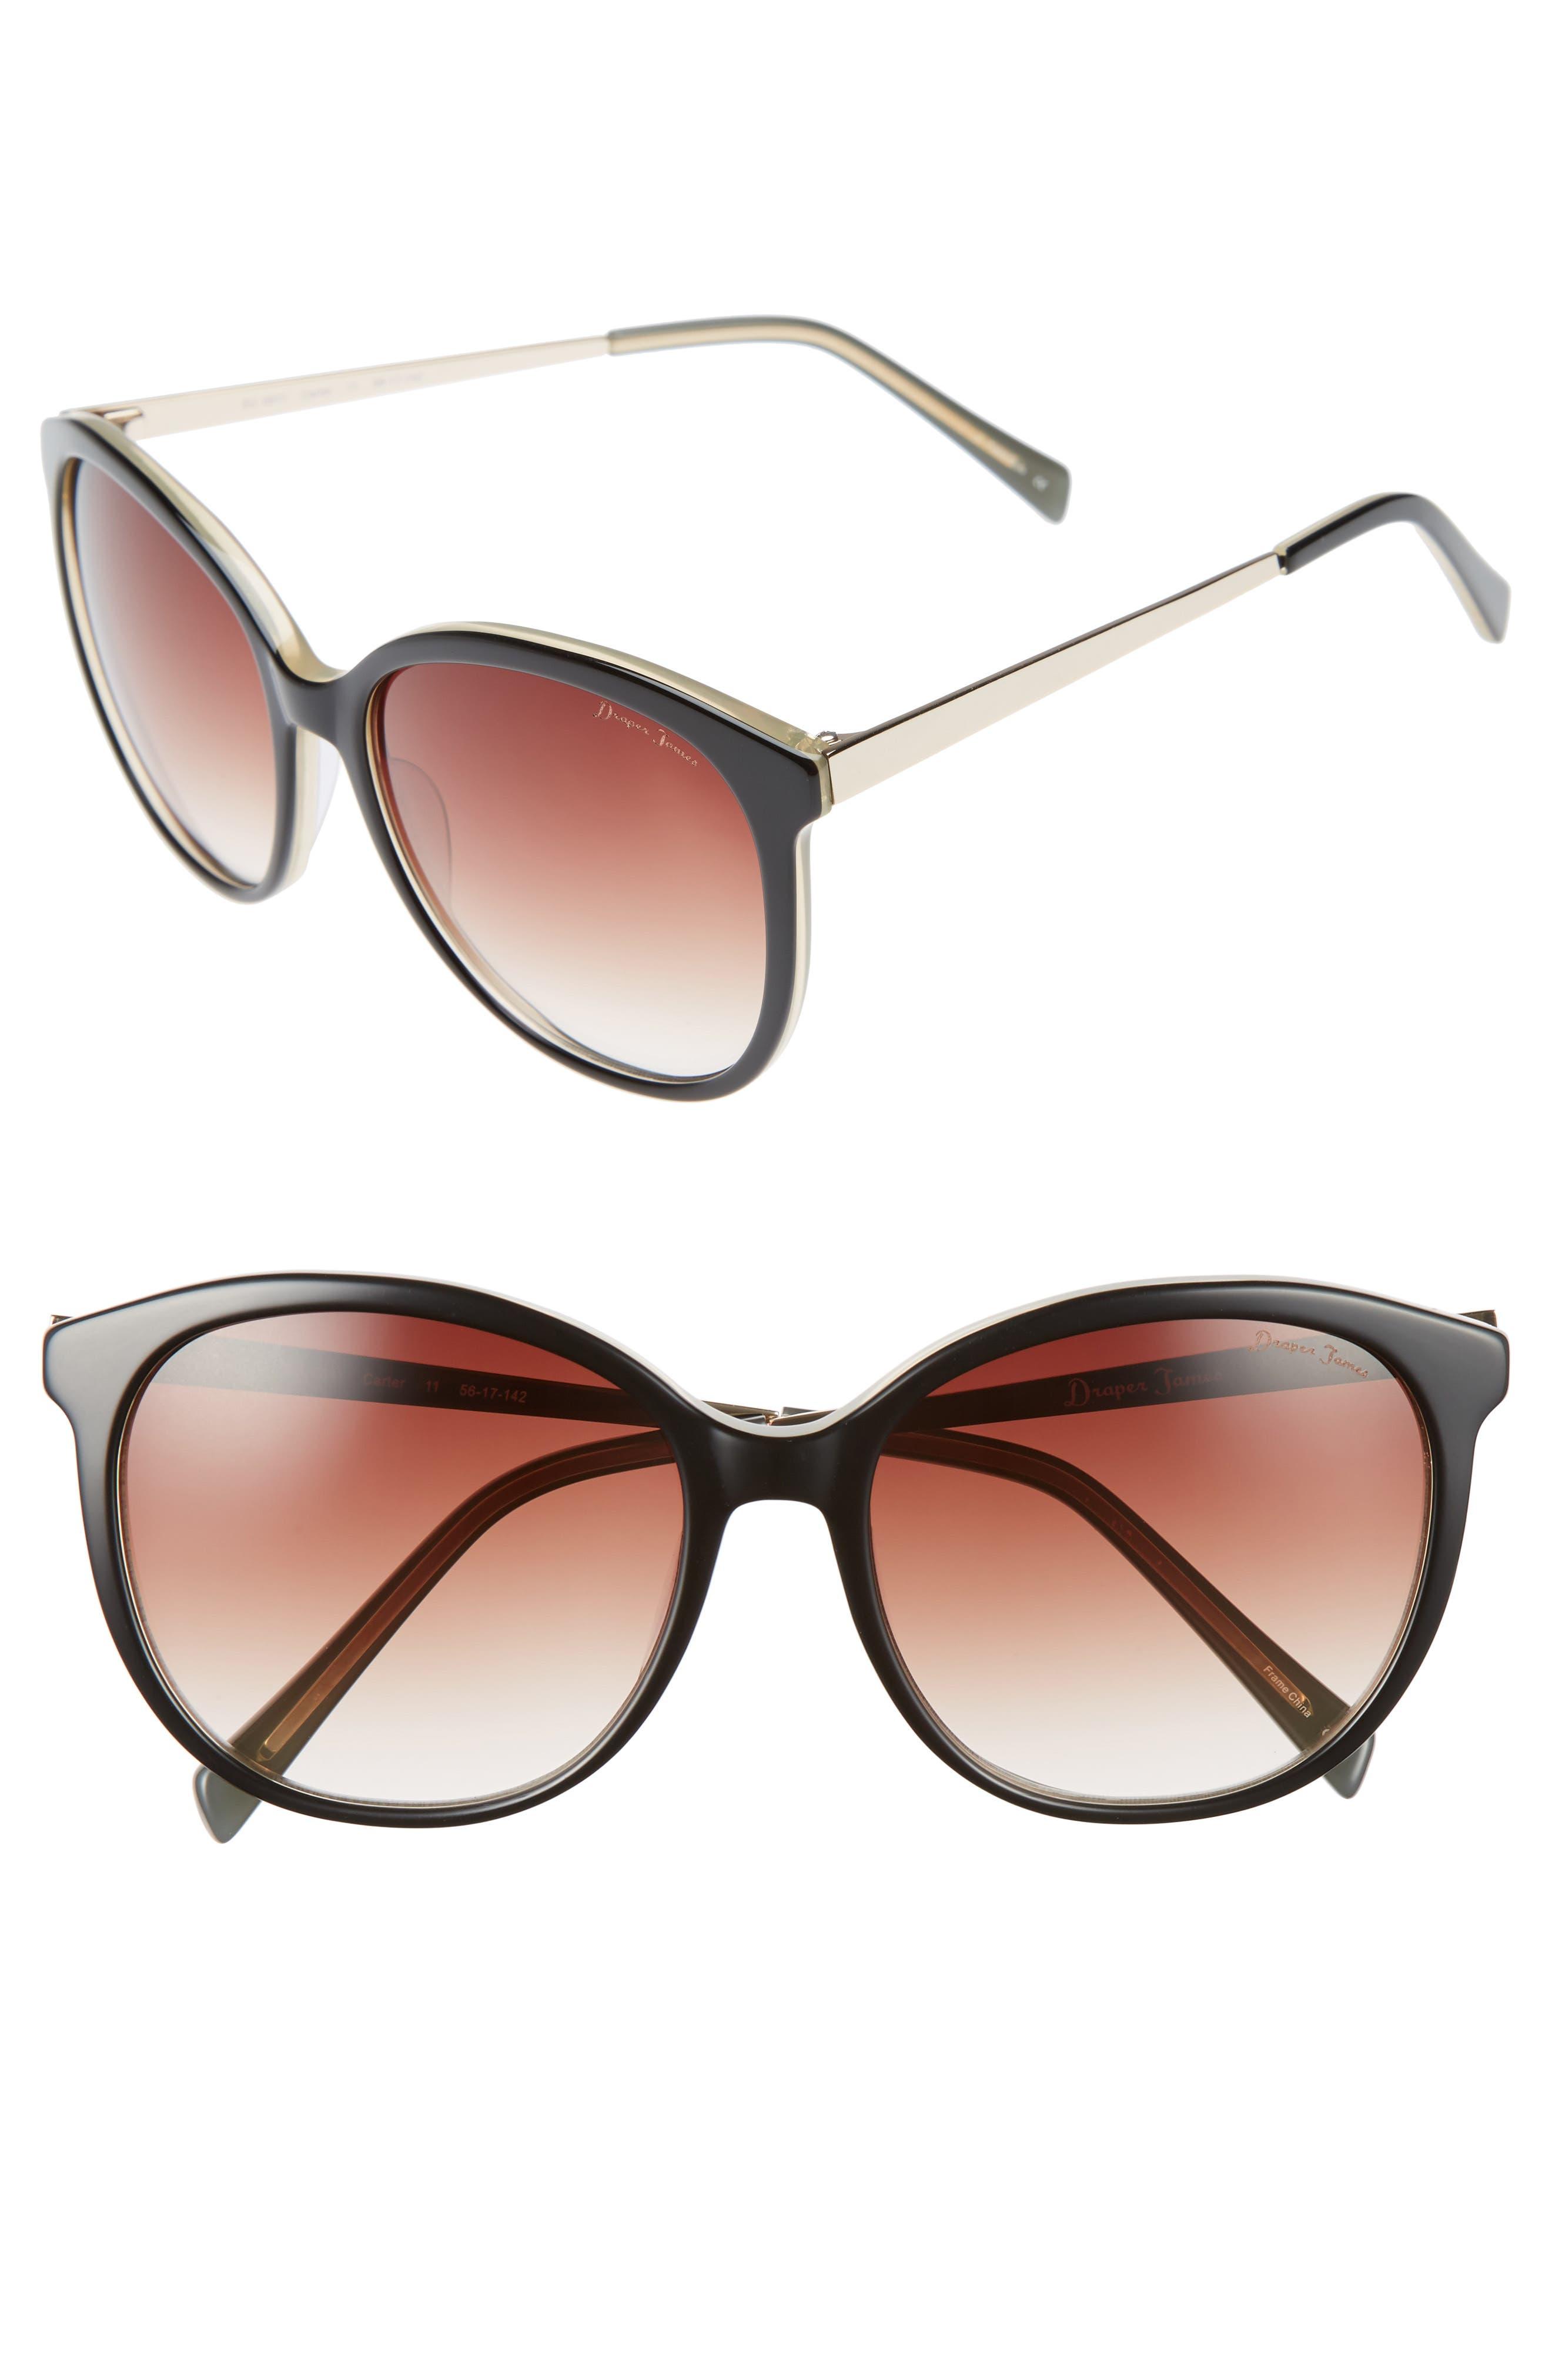 DRAPER JAMES 56mm Gradient Lens Sunglasses, Main, color, 001